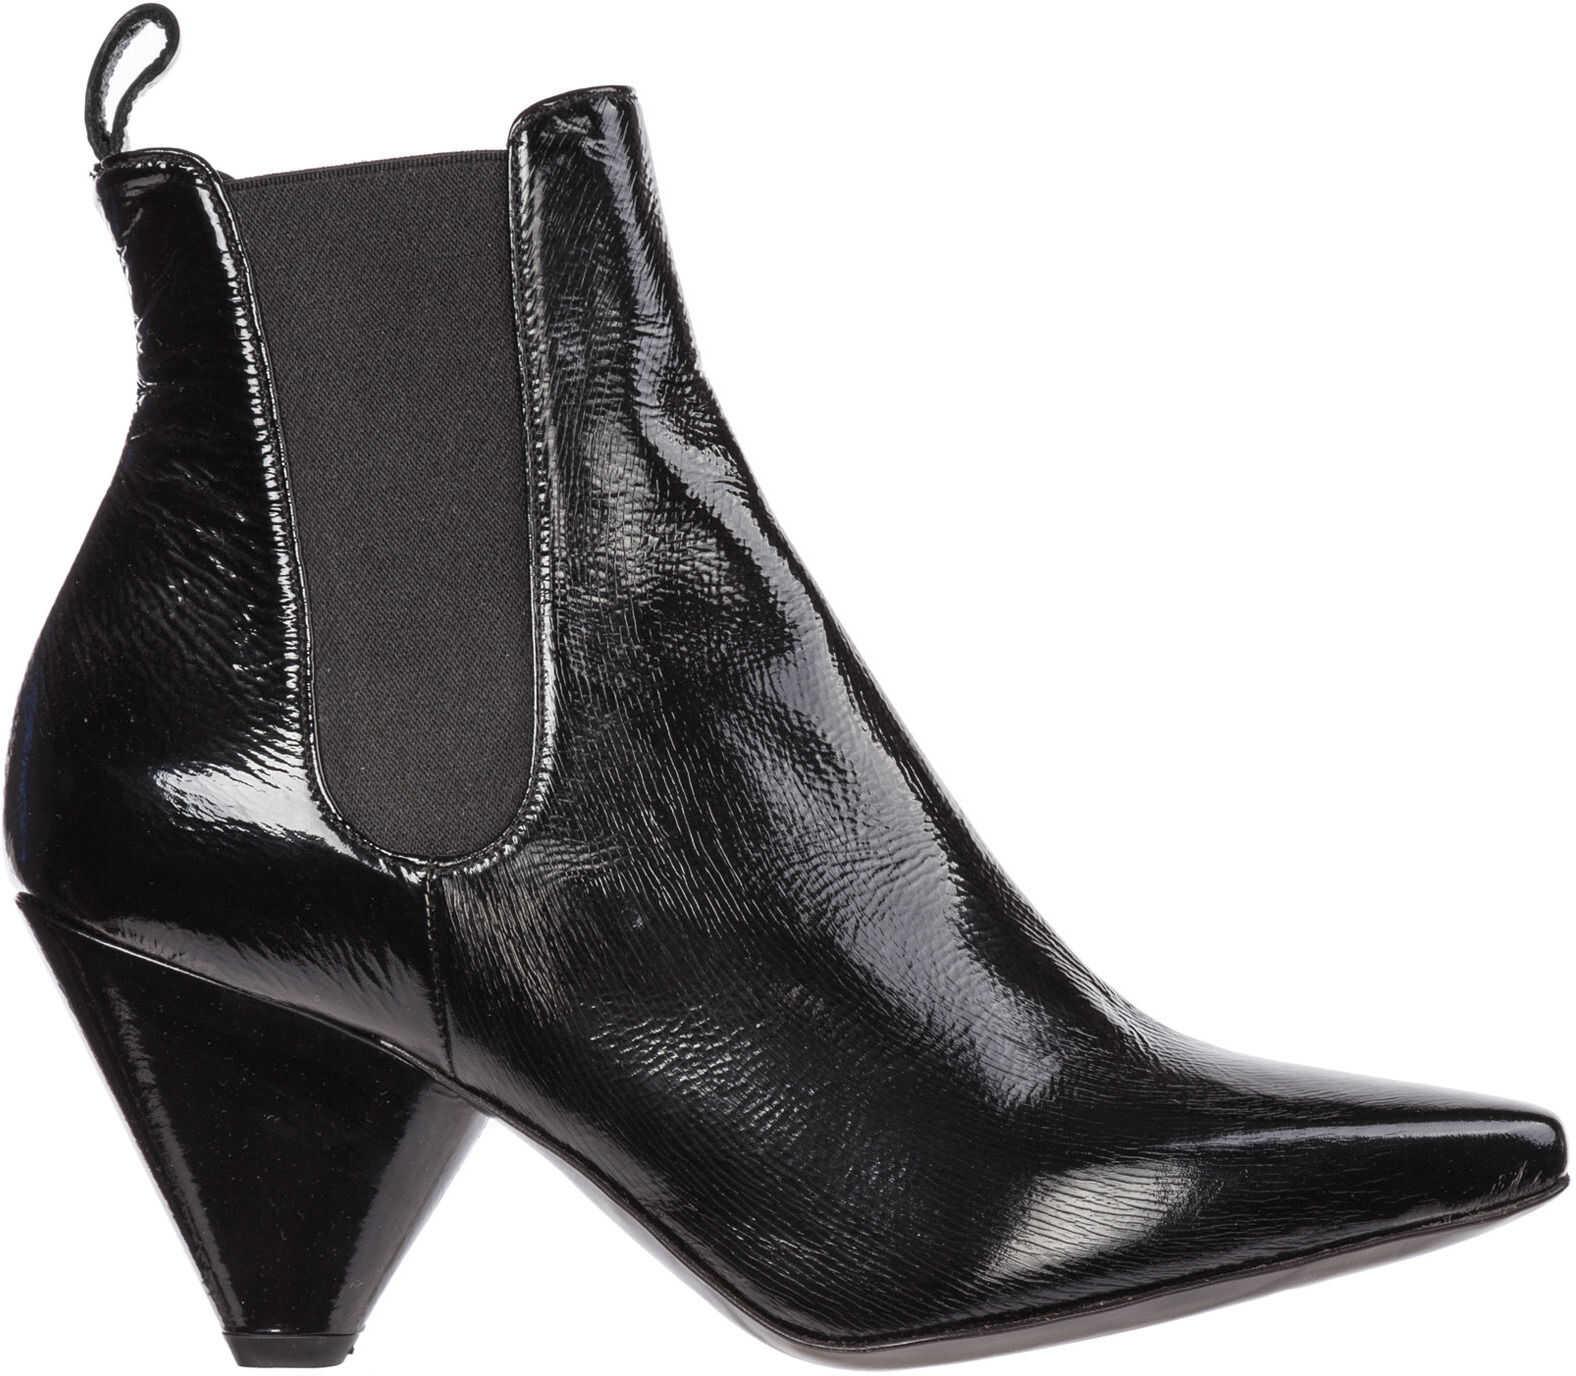 Premiata Boots Booties M4925 Black imagine b-mall.ro